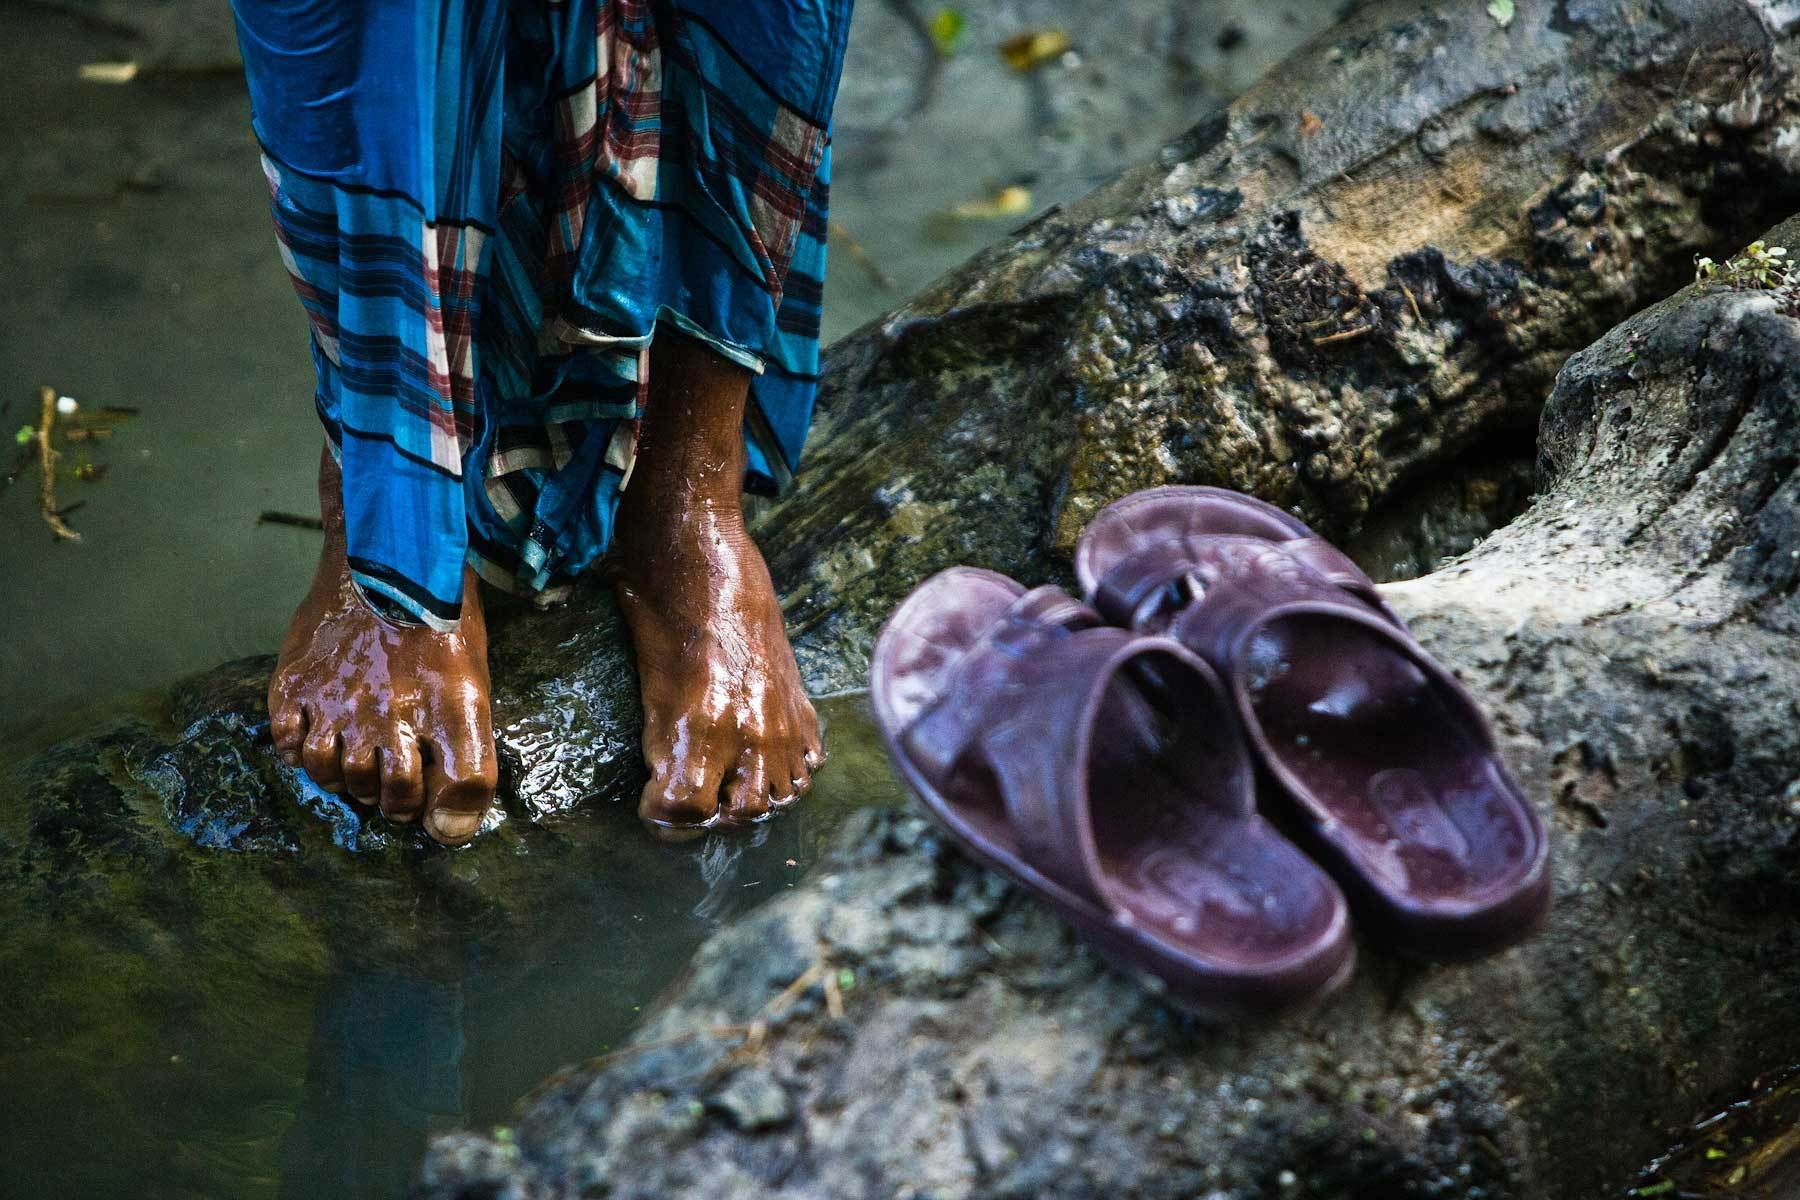 1002bangladesh_cyclone_recovery.jpg